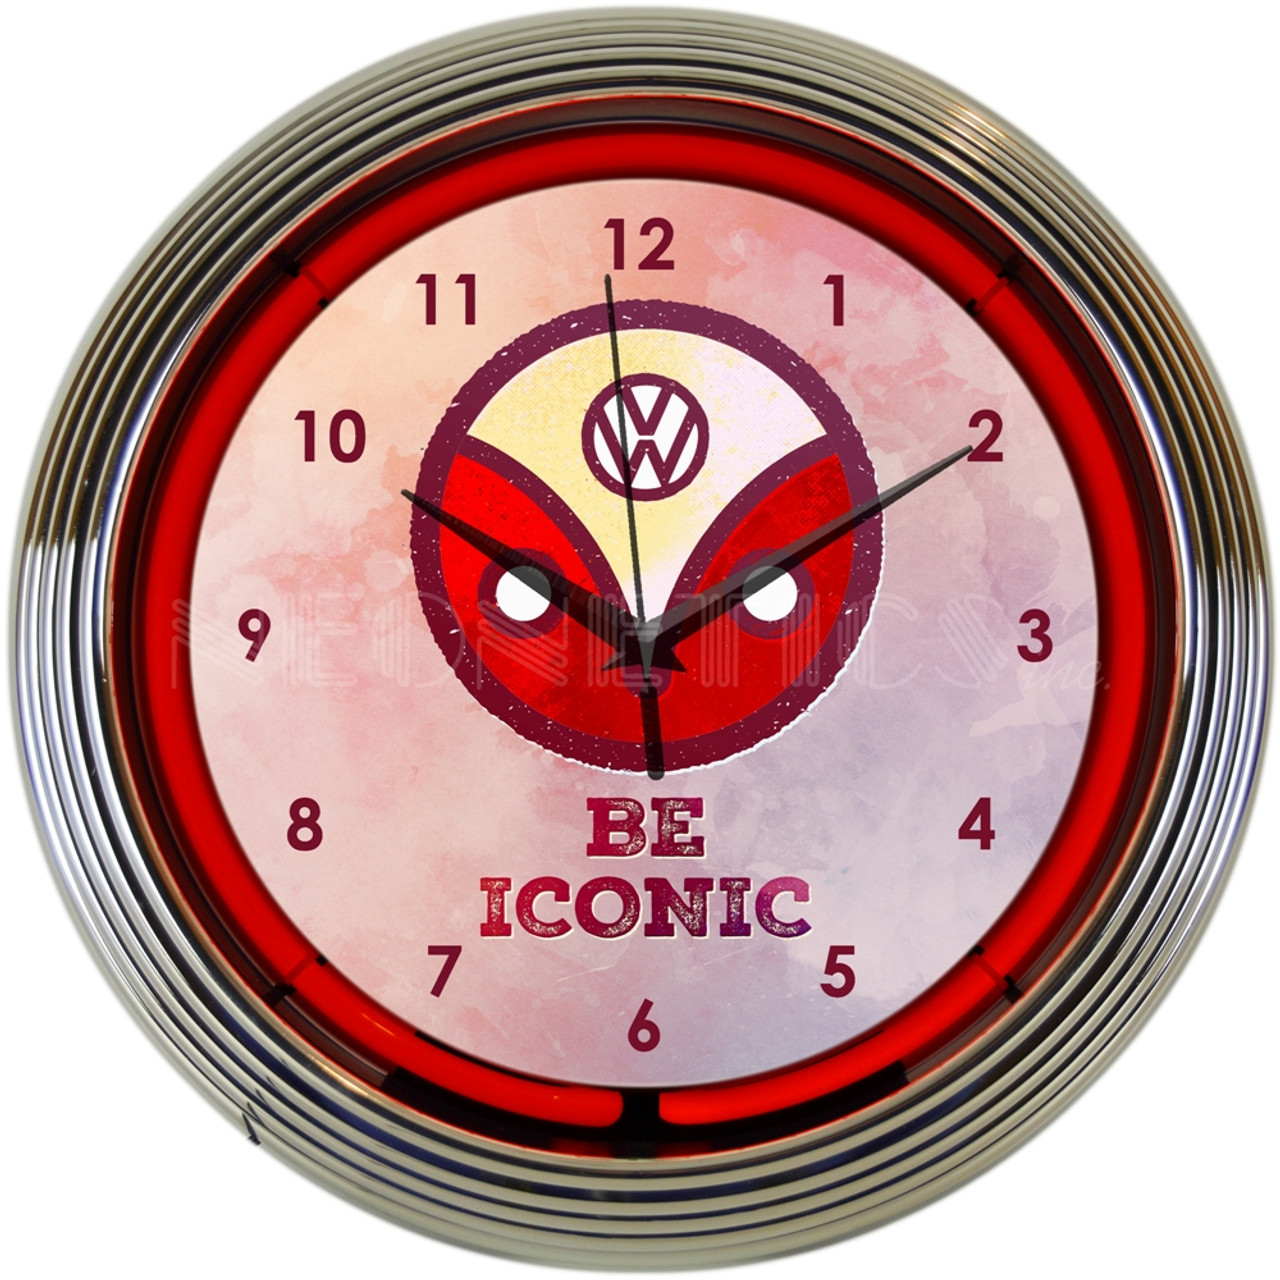 VW Be Iconic Neon Clock